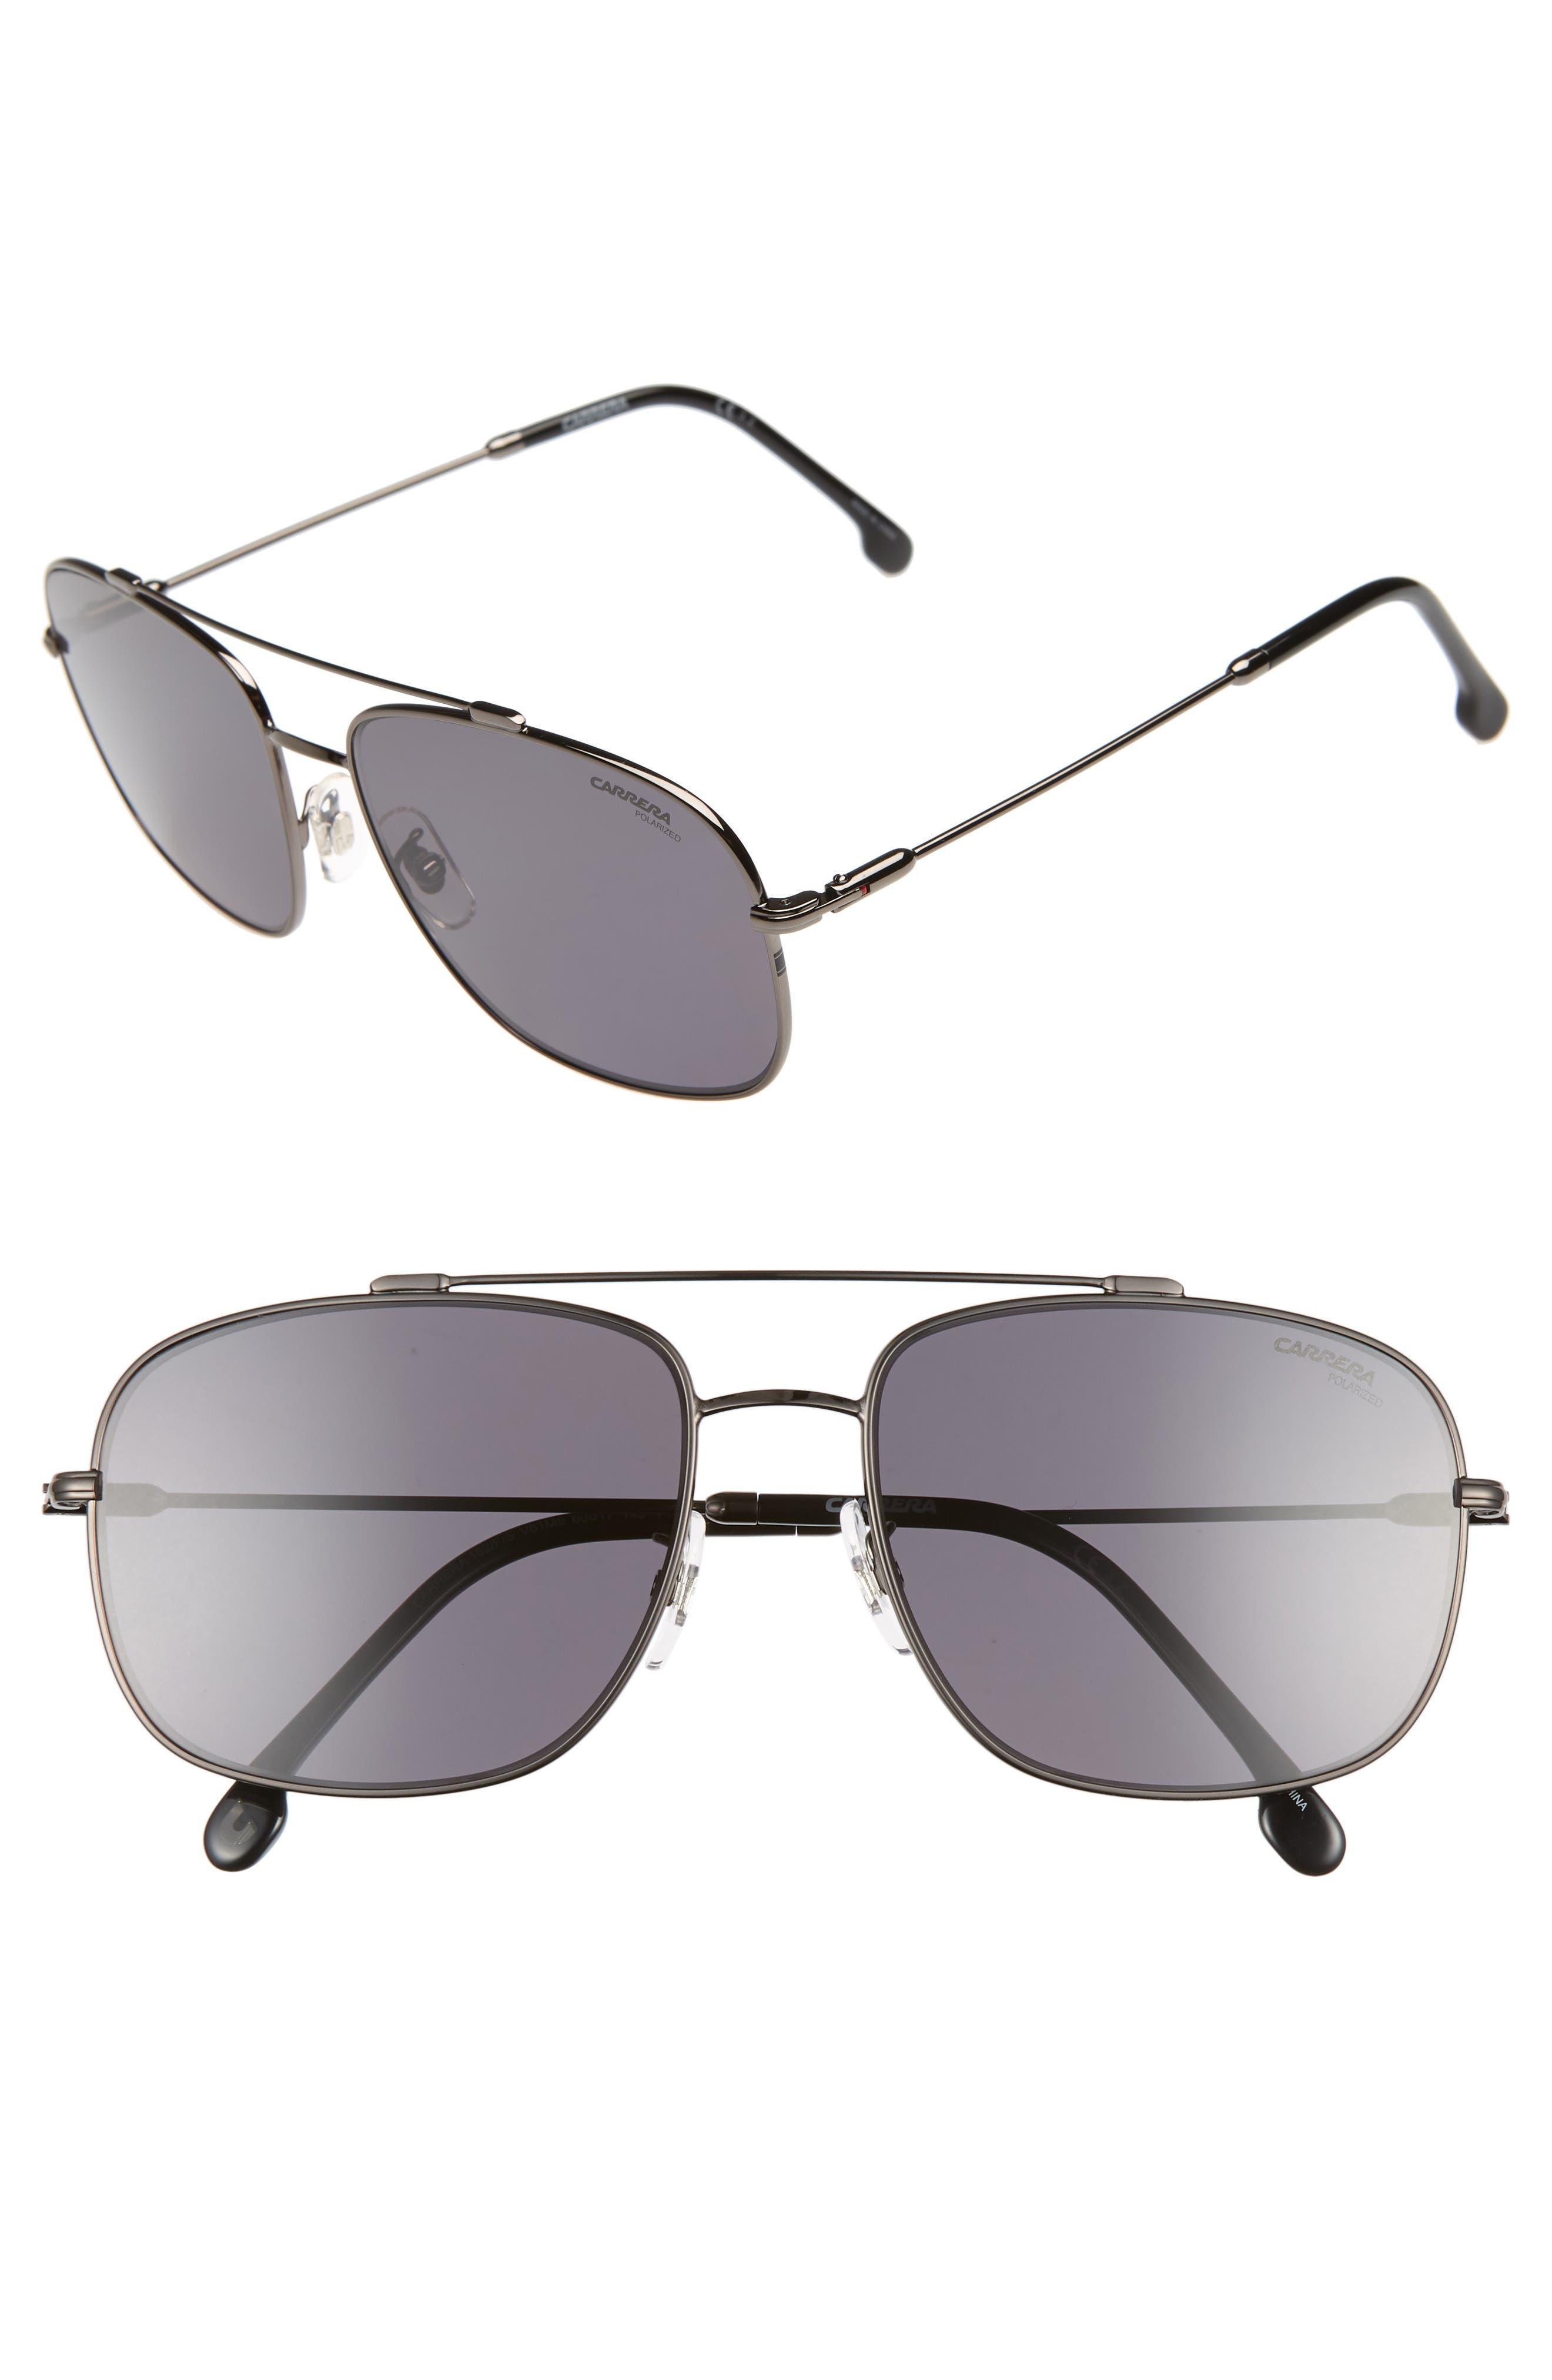 60mm Special Fit Polarized Navigator Sunglasses,                             Main thumbnail 1, color,                             DARK RUTHENIUM/ BLACK